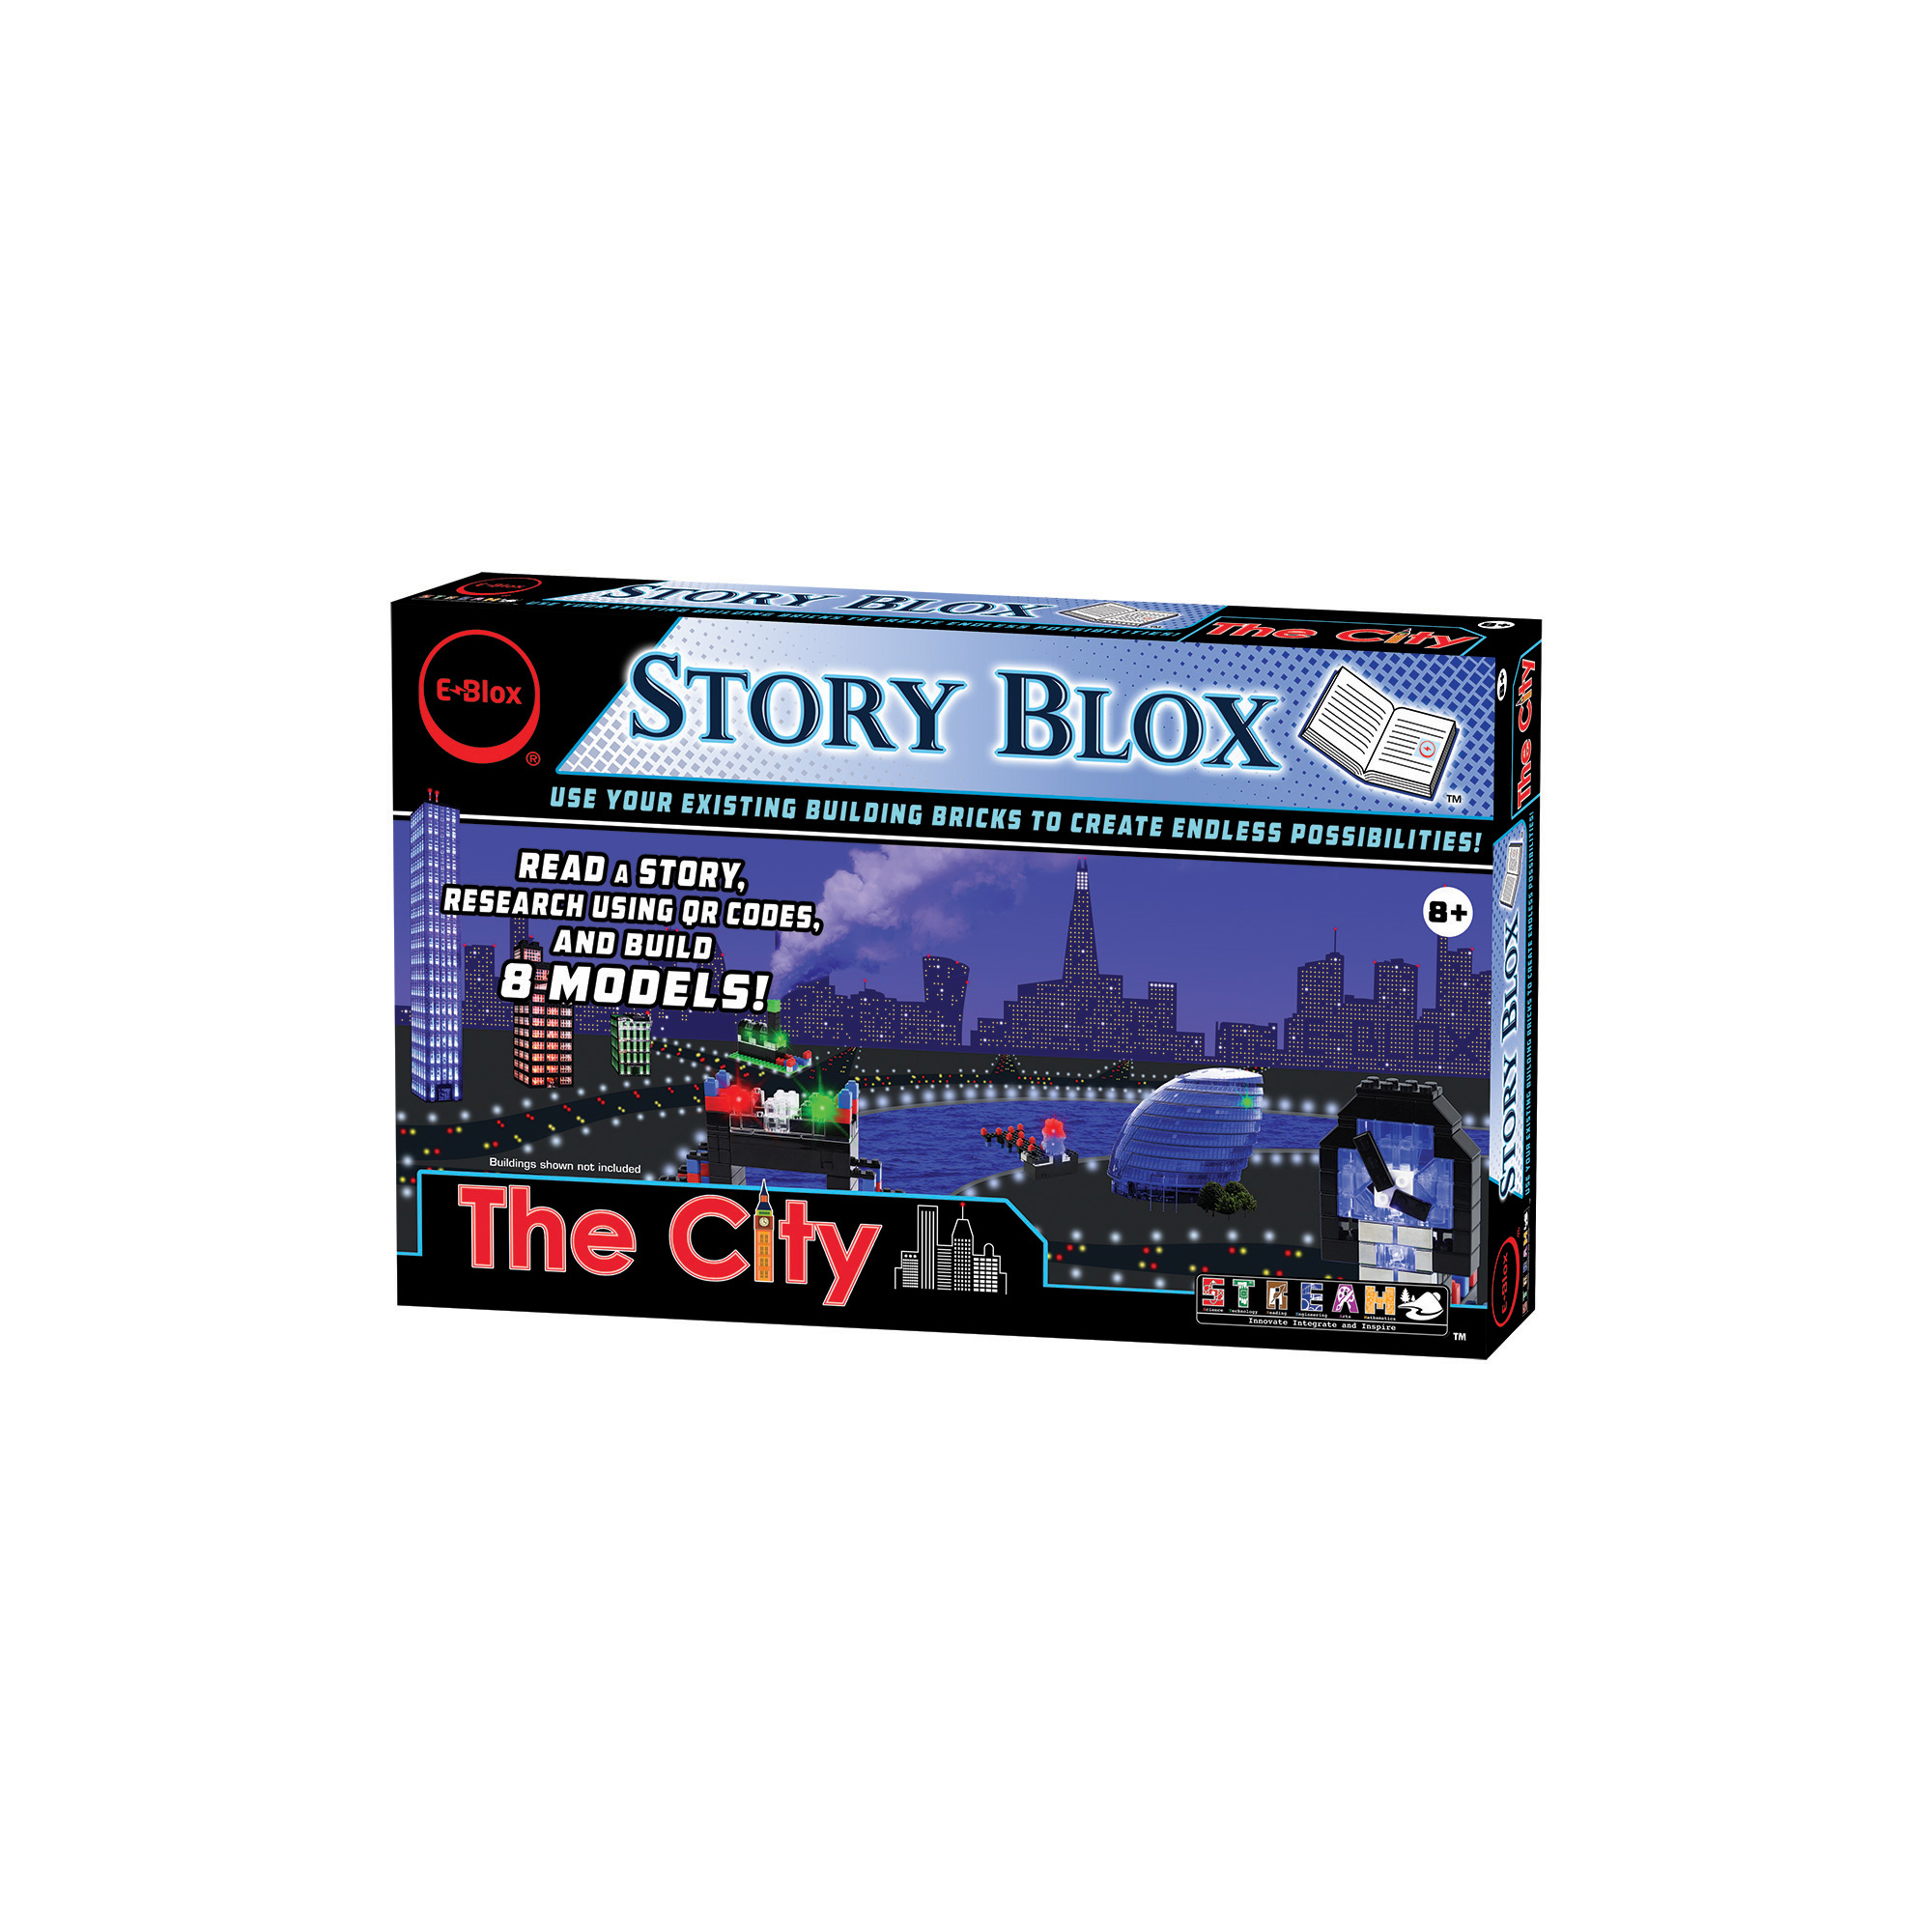 Story Blox - The City